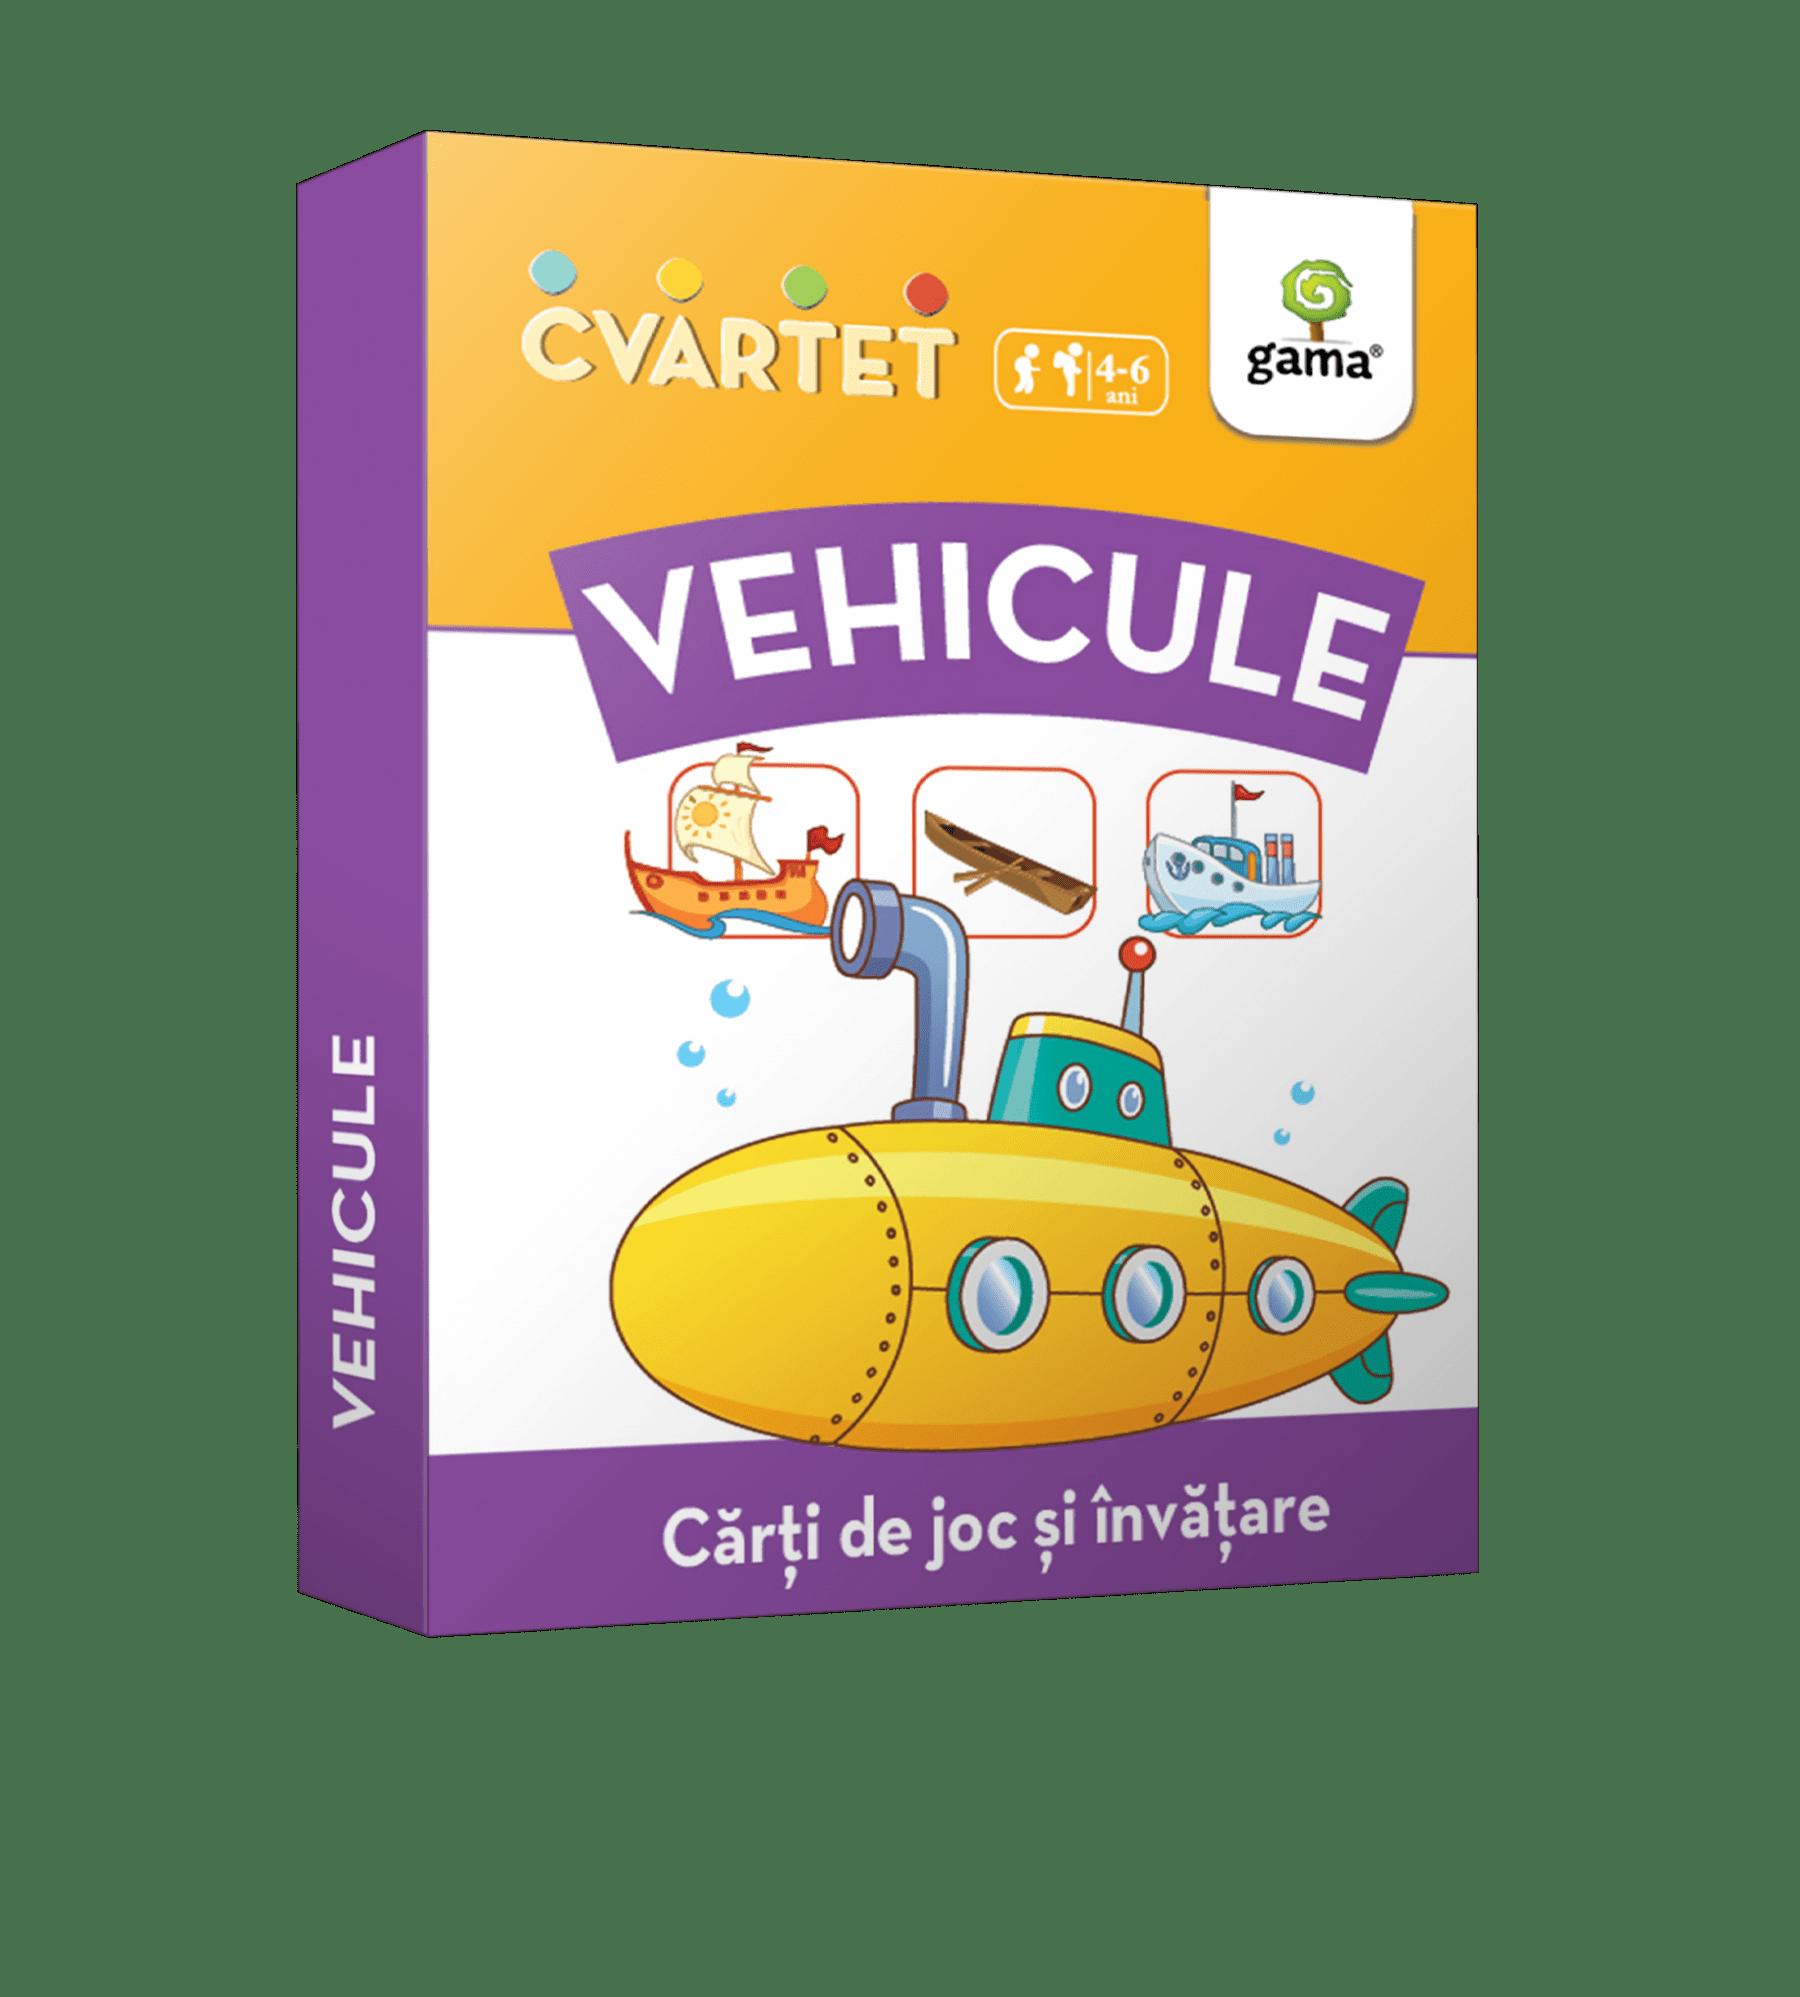 cutie_vehicule_cvartet